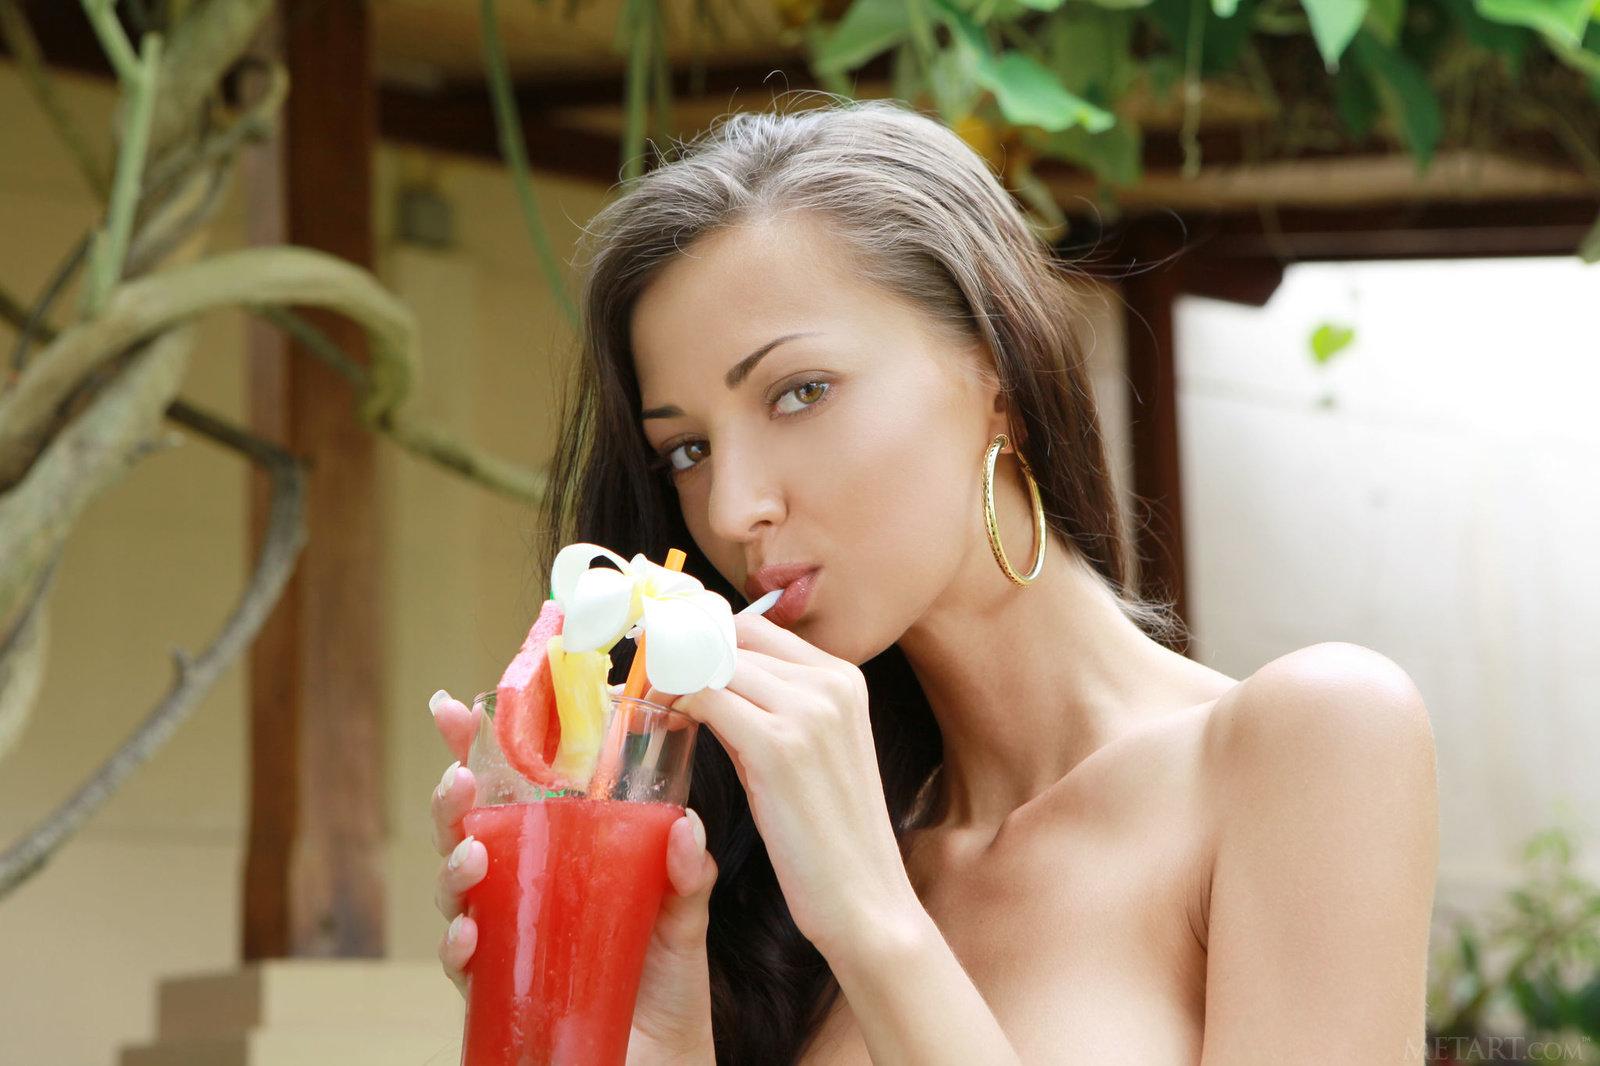 Skinny ukrainian sex